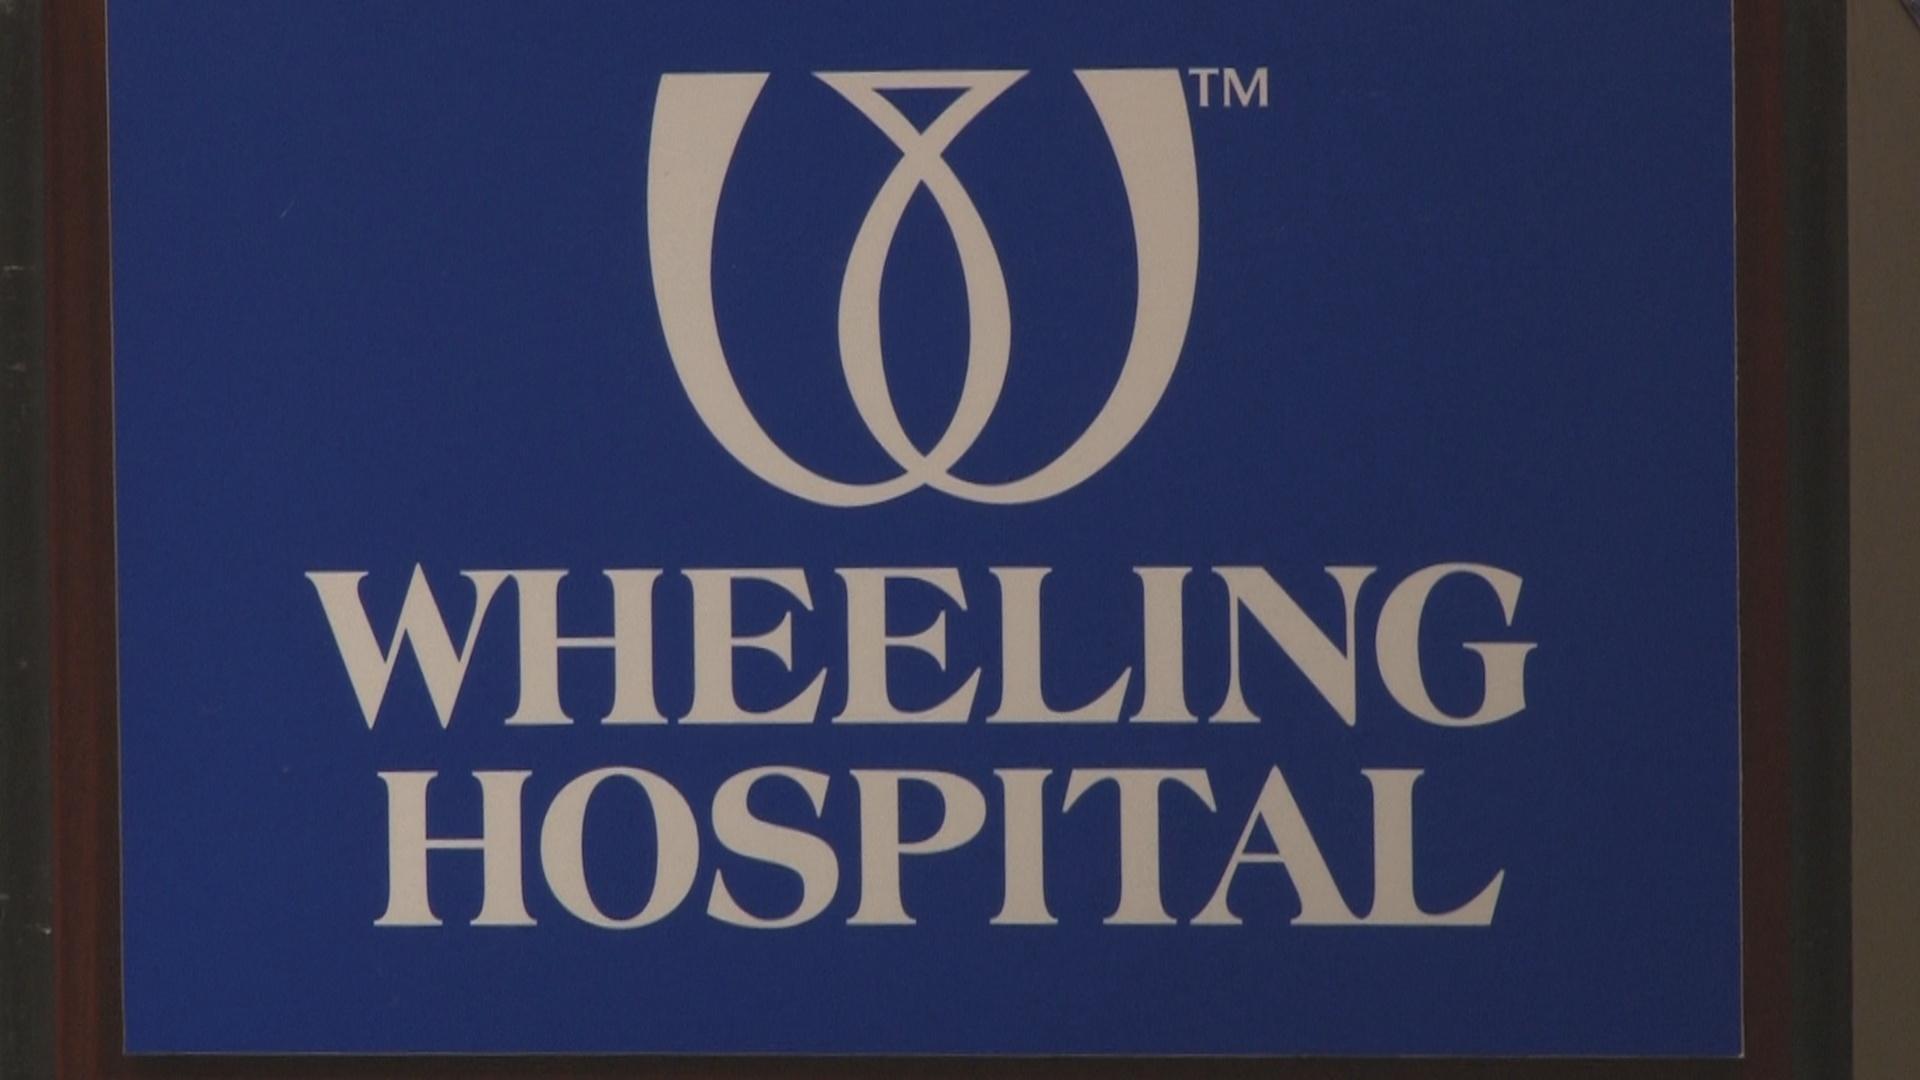 Wheeling Hospital.jpg